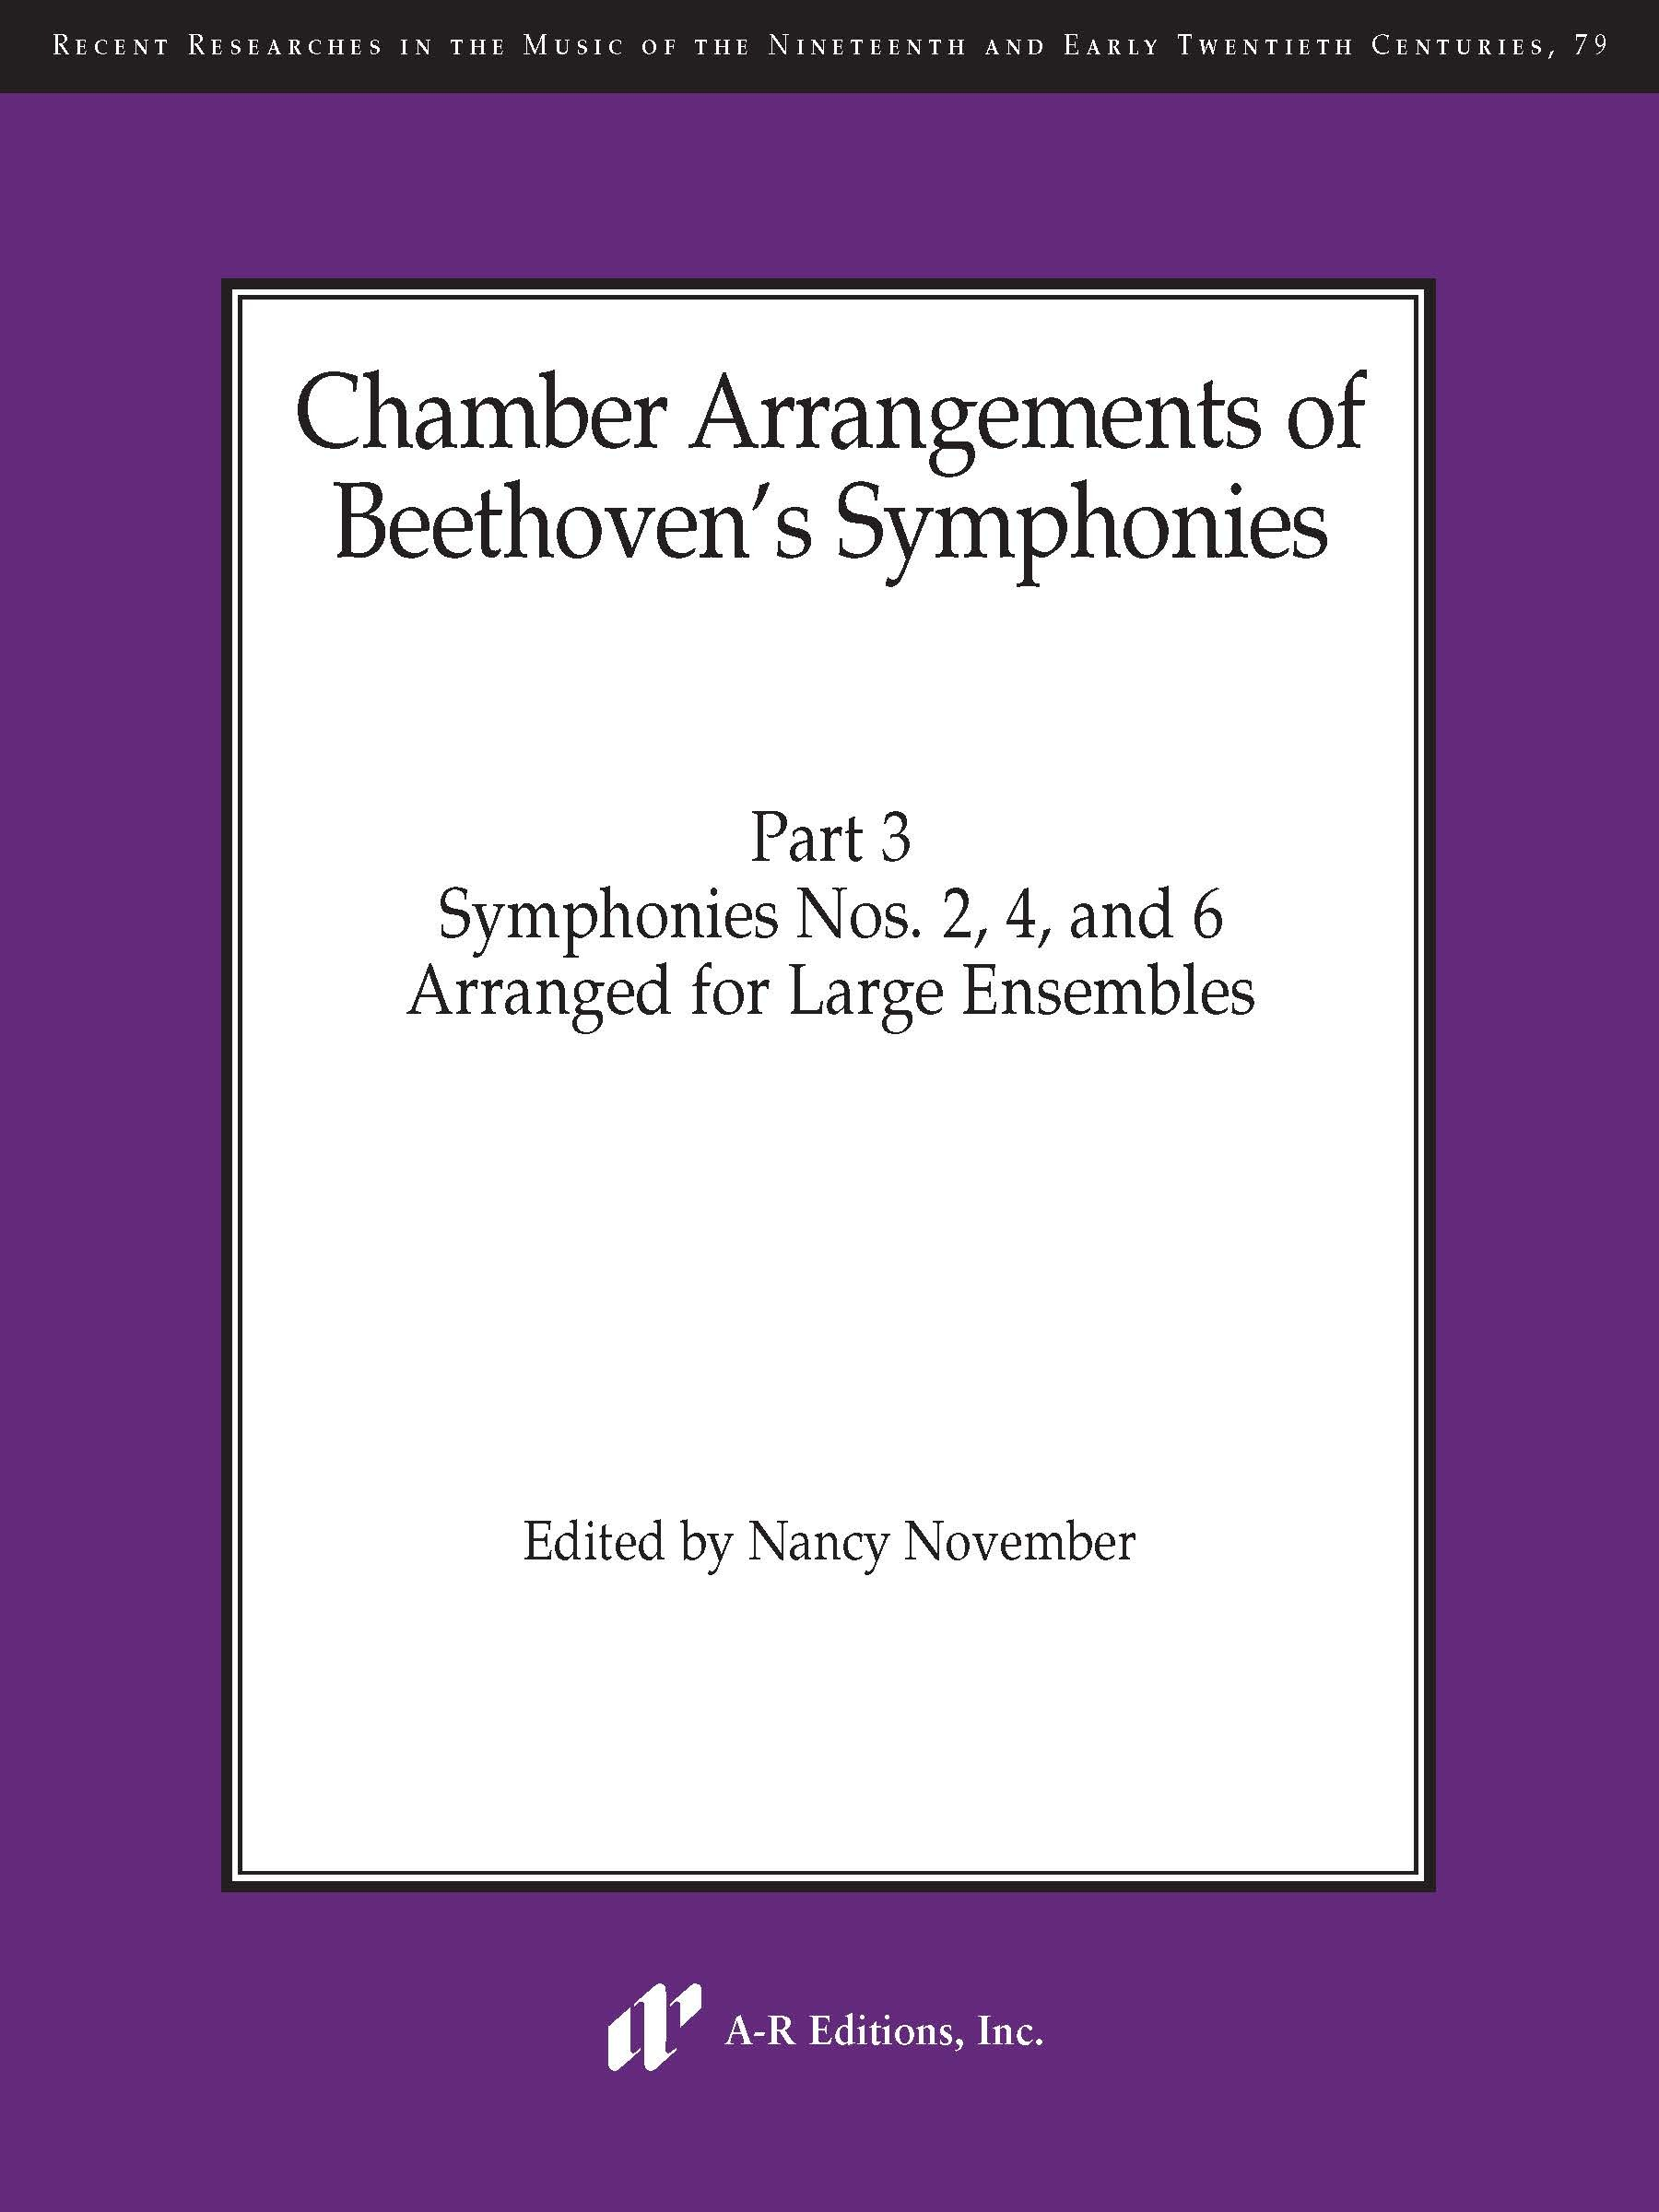 Chamber Arrangements of Beethoven's Symphonies, Part 3